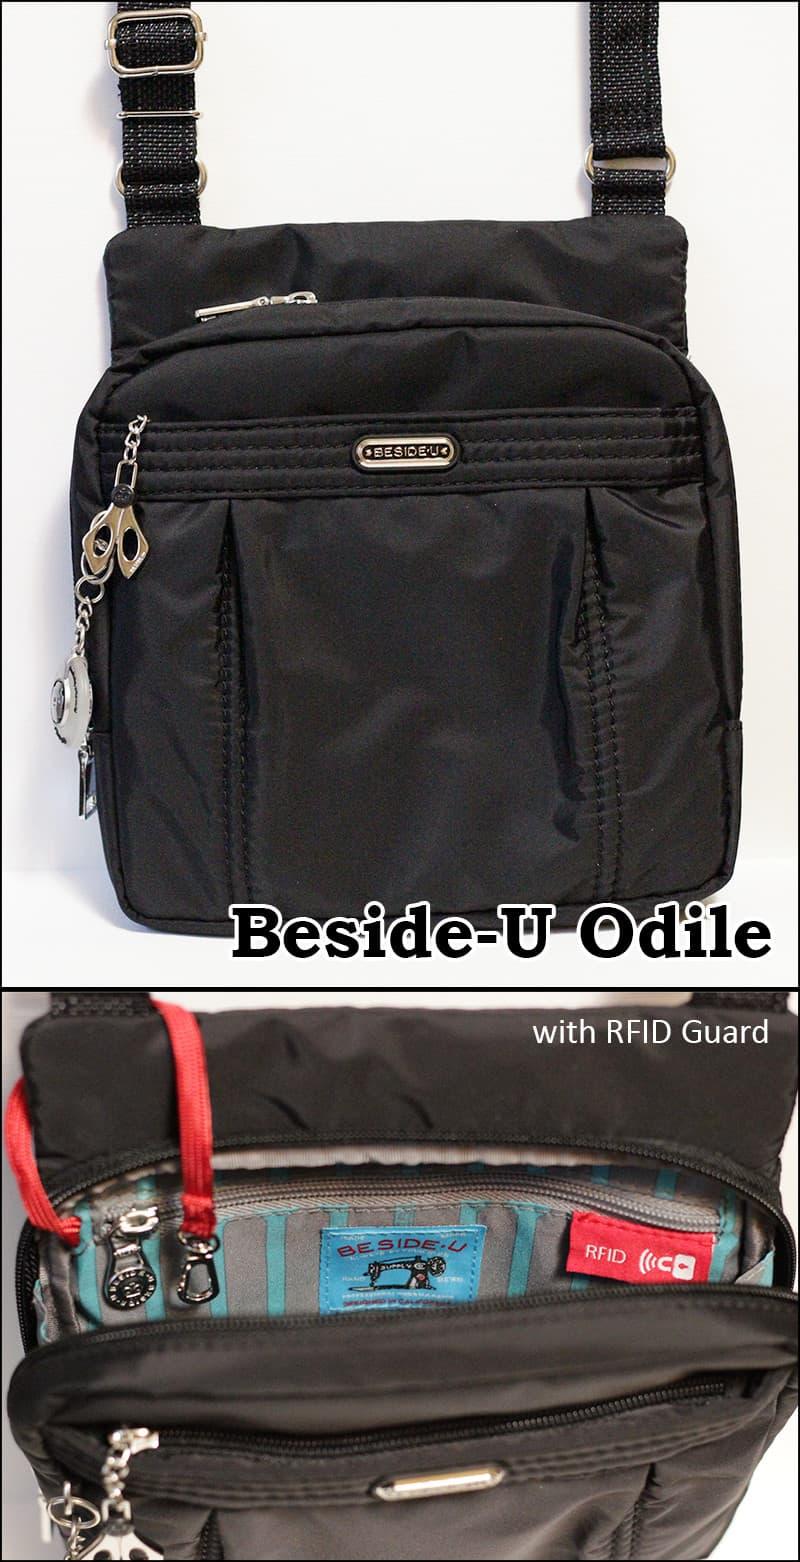 Beside-U Odile RFID Blocking Bag